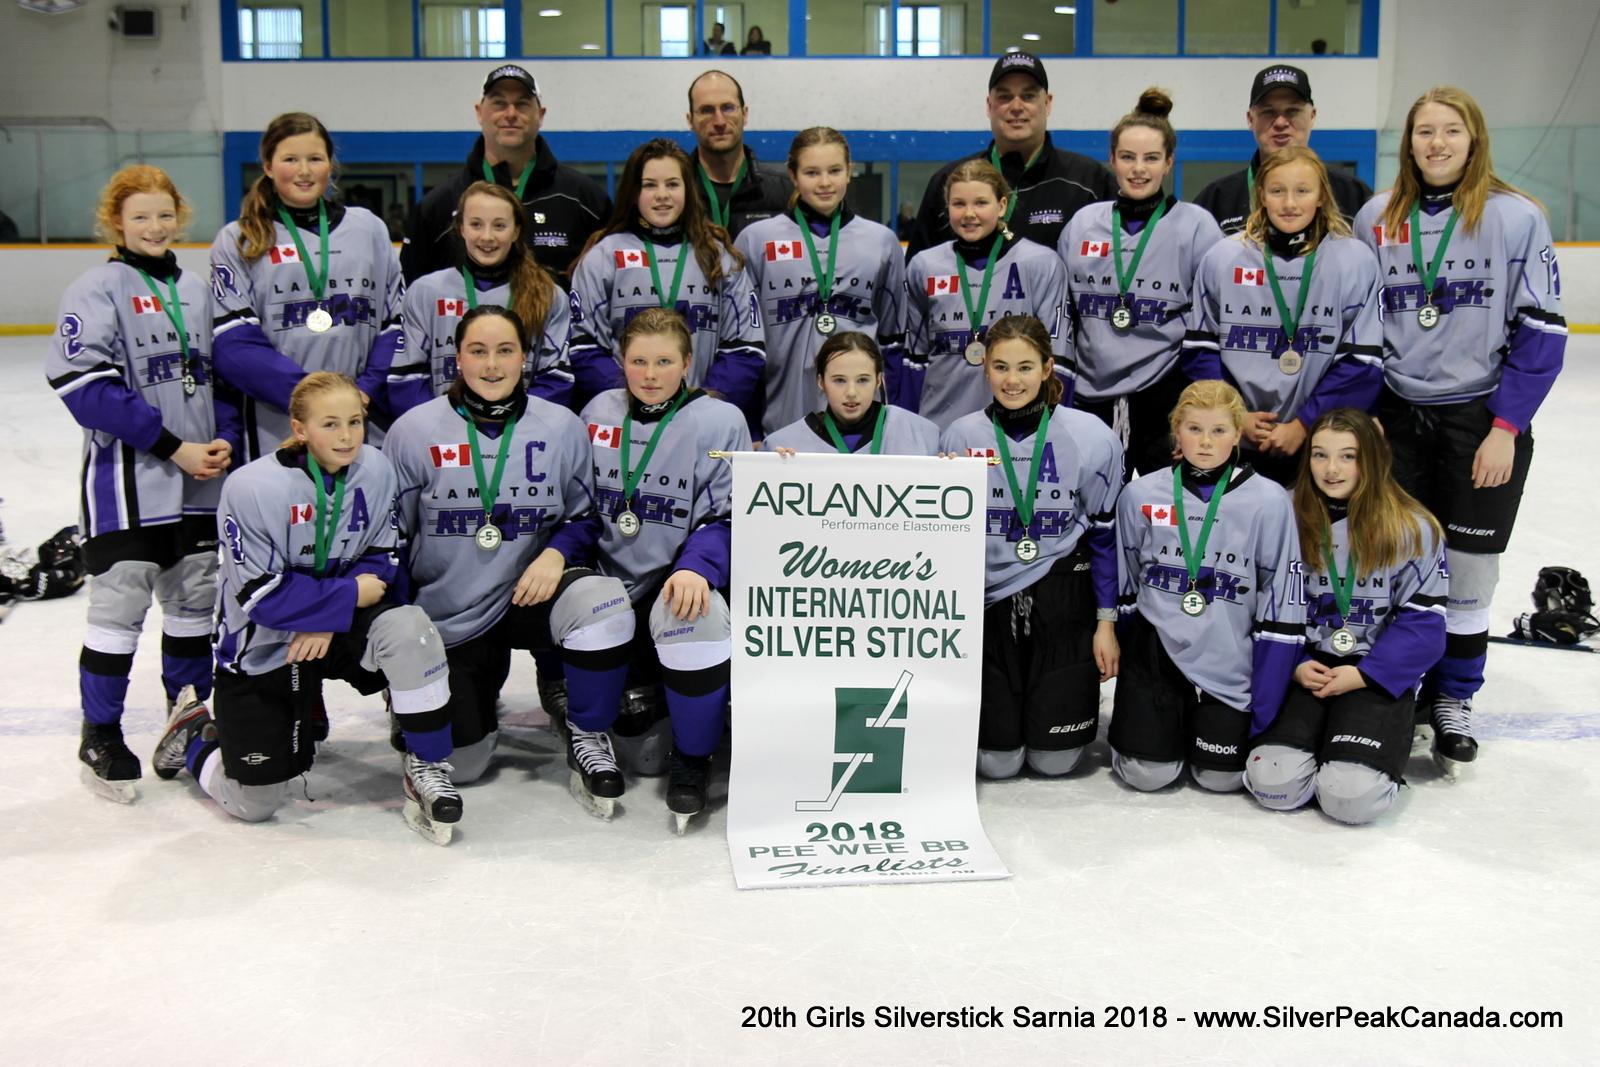 silverpeak studios canada girls silverstick sarnia ontario 2018 (16)